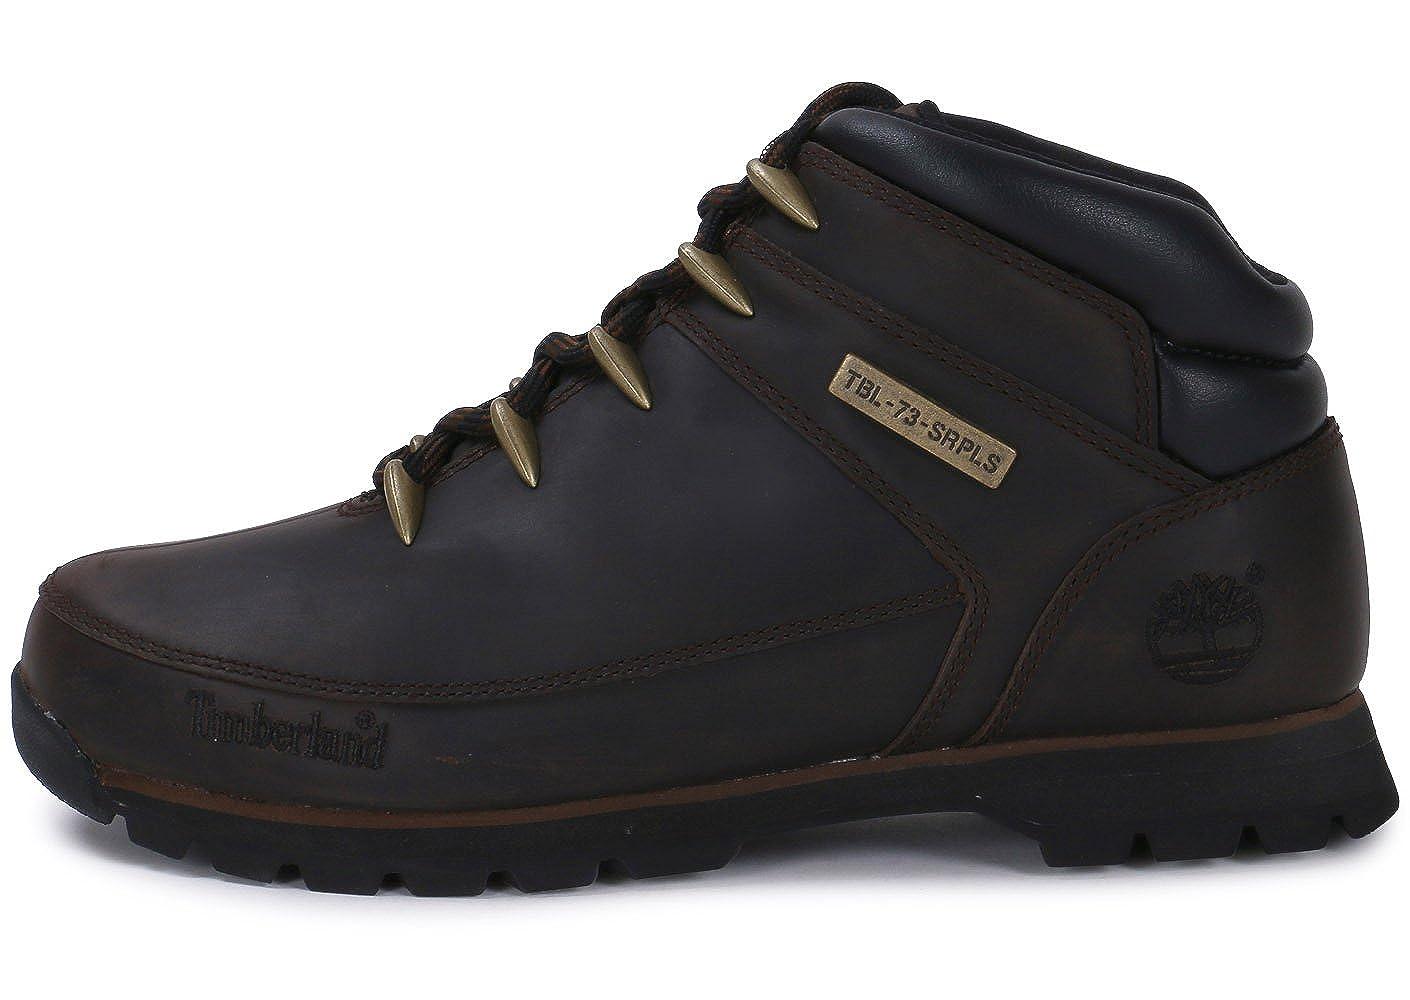 4d22e242791 Timberland Mens Euro Sprint Hiker Dark Brown A11ZM Leather Boots 6.5 ...